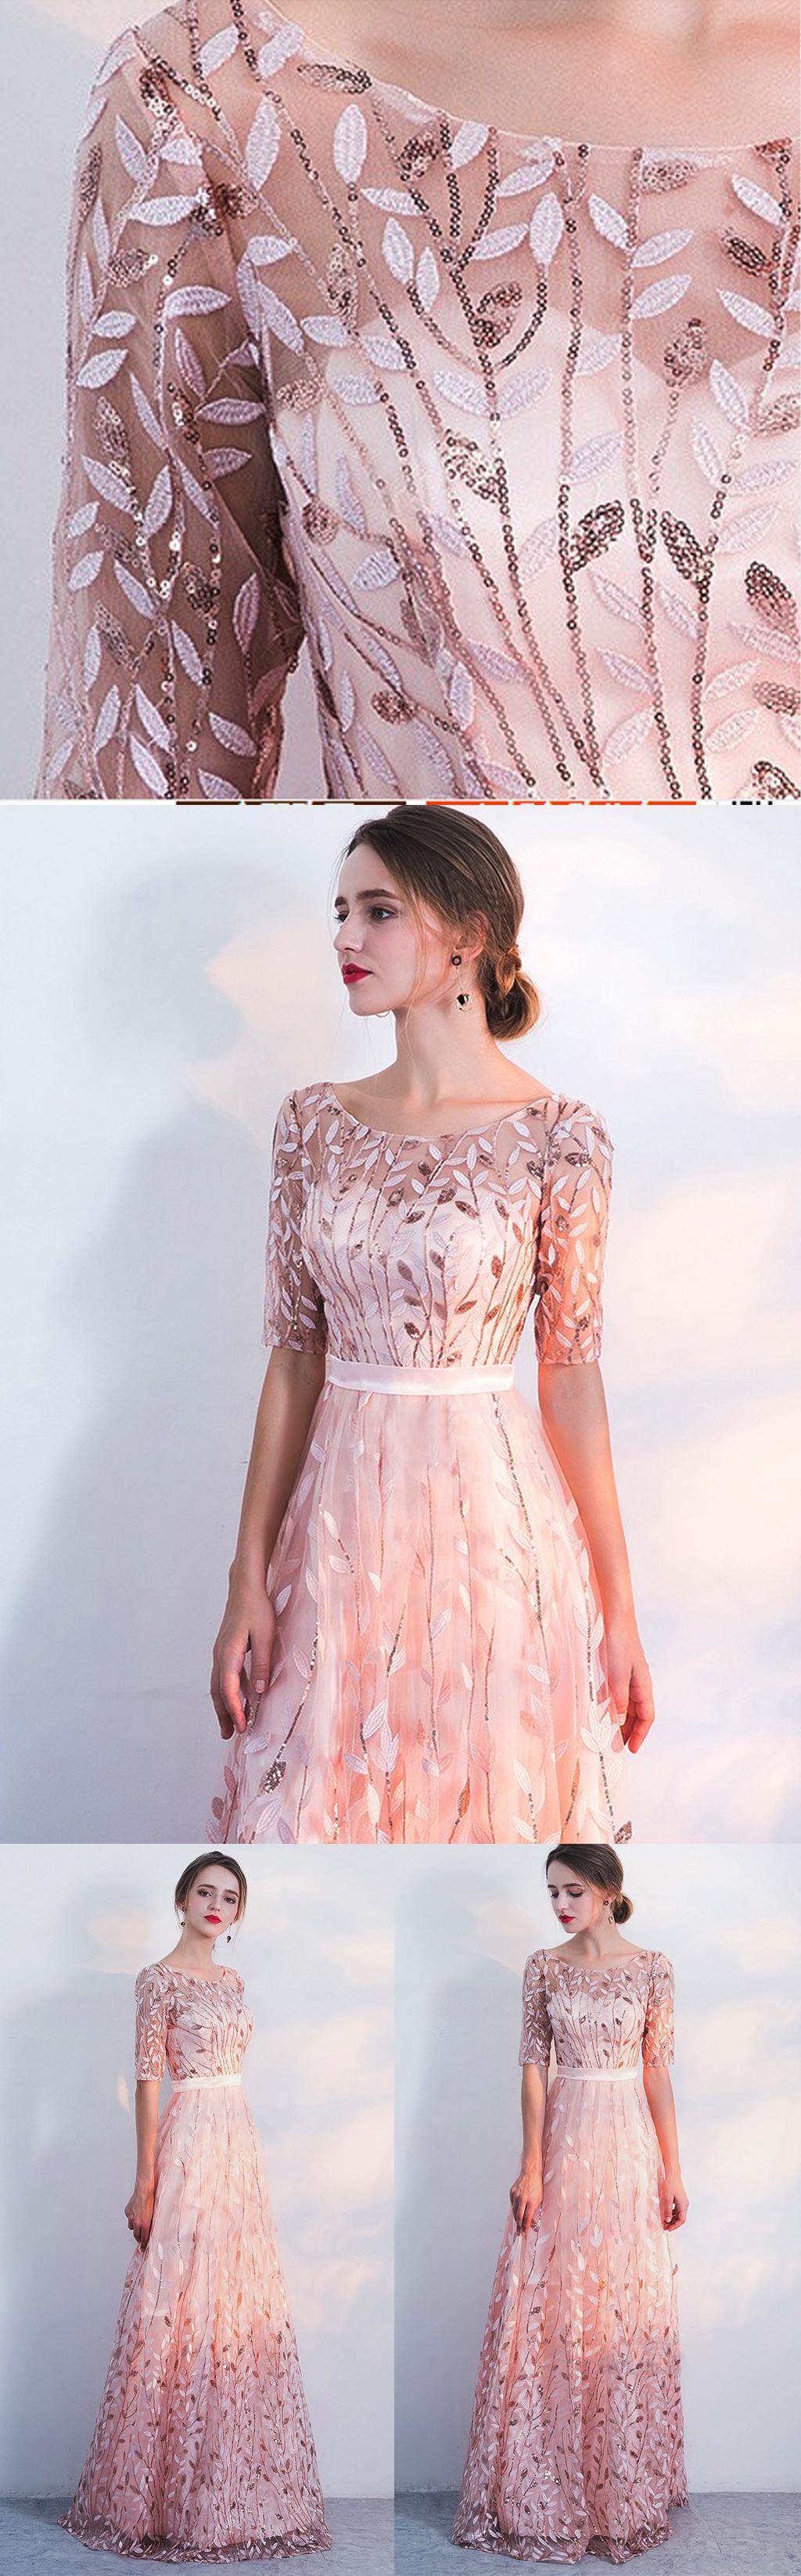 Unique sequin appliques prom dress.Half sleeve a-line prom ...